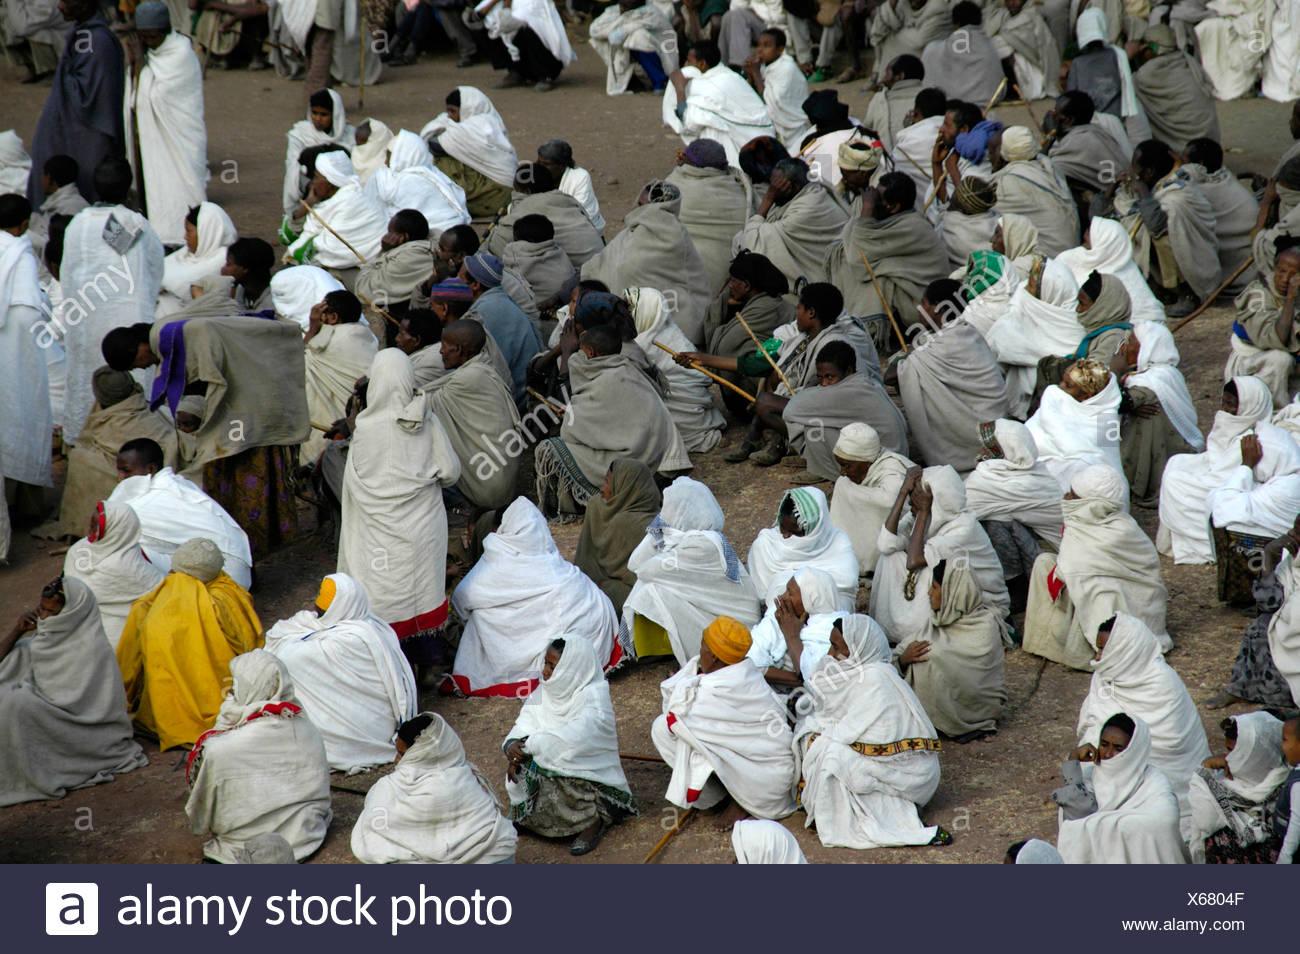 Ethiopian Orthodox Christianity, congregation of believers wearing white and grey vestments, Lalibela, Ethiopia, Africa - Stock Image